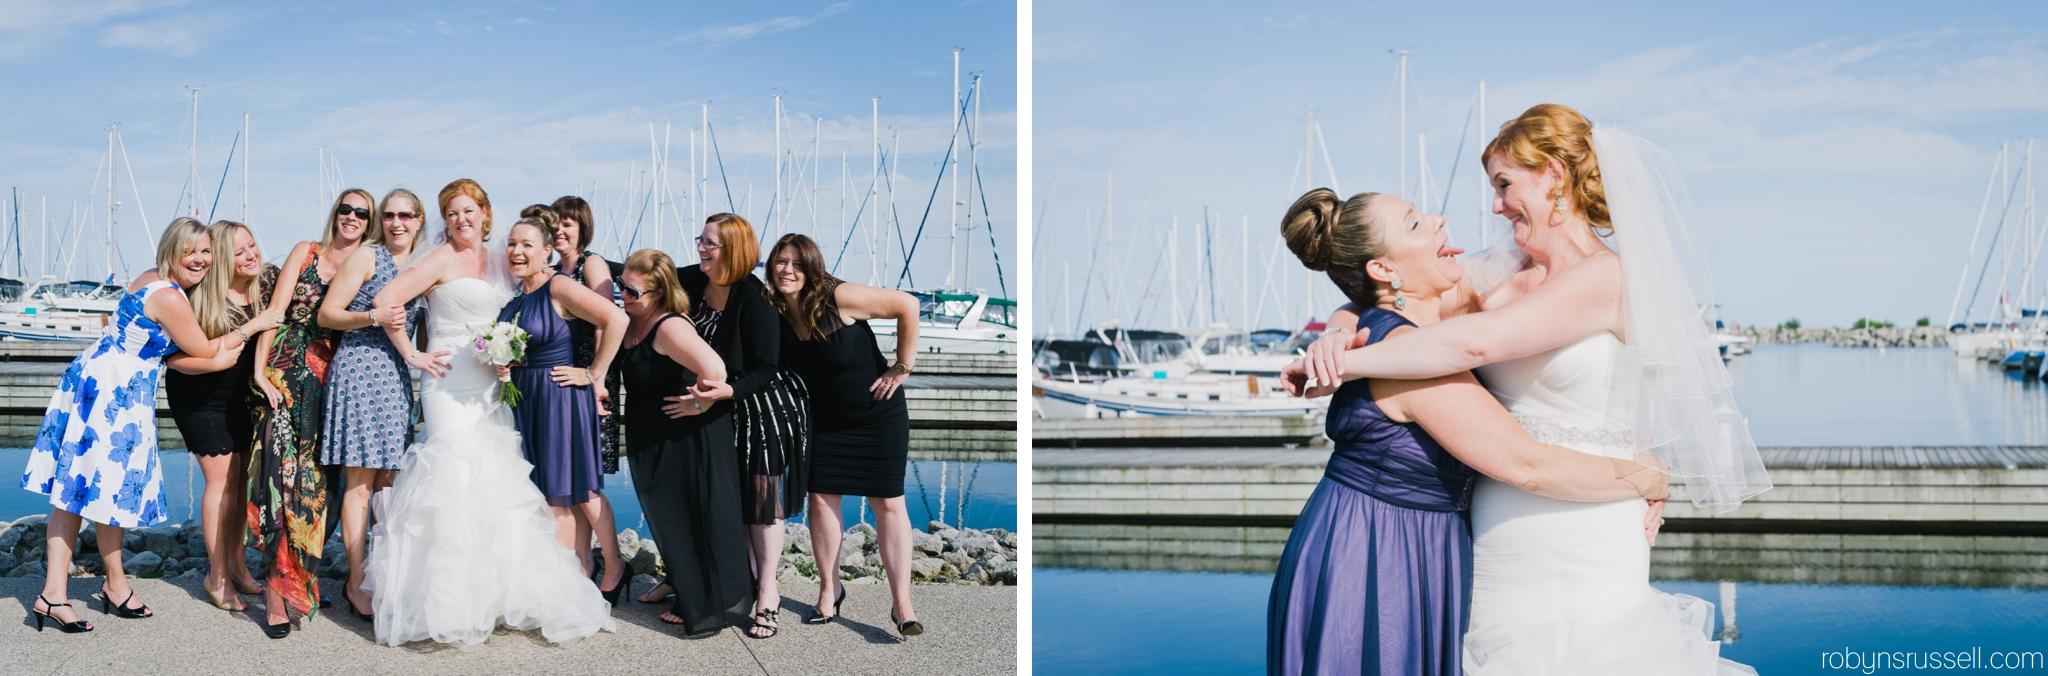 19-bride-and-girlfriends-oakville-harbour-wedding-photographer.jpg